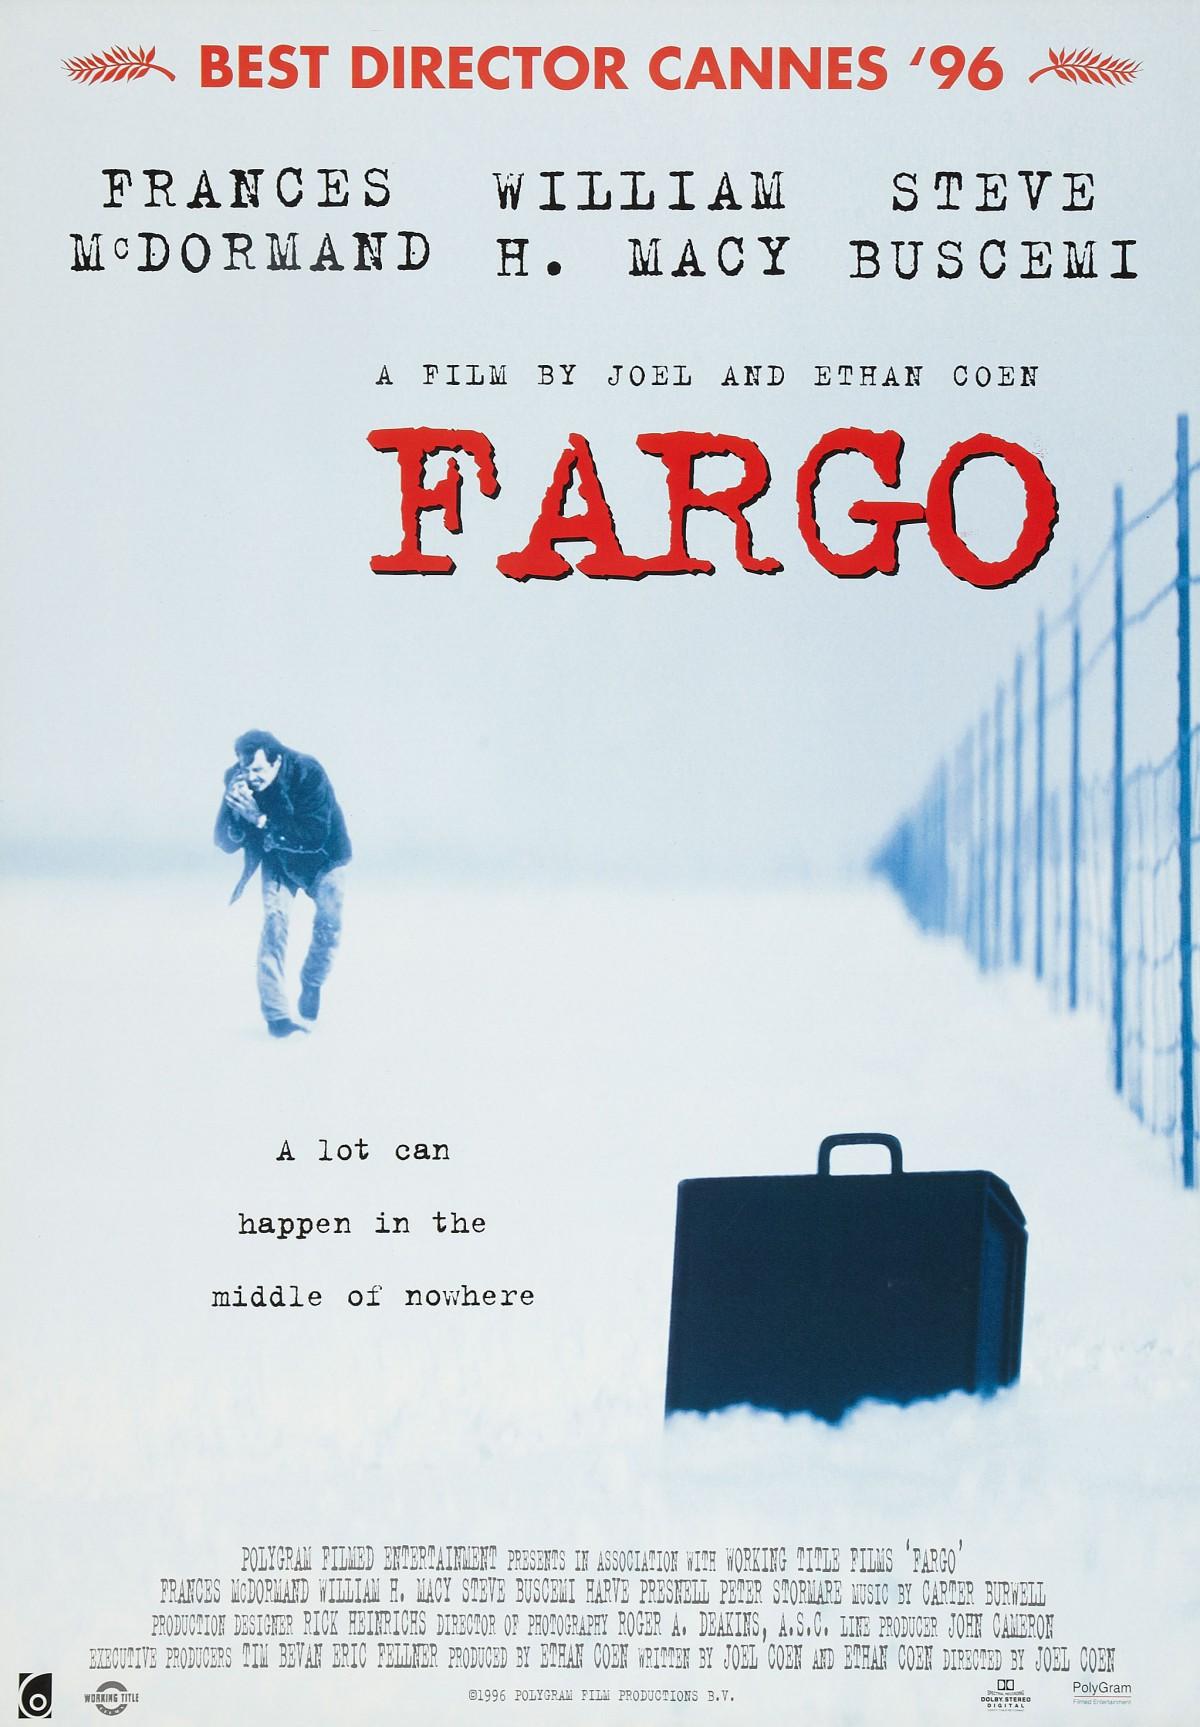 91. Fargo (1996)